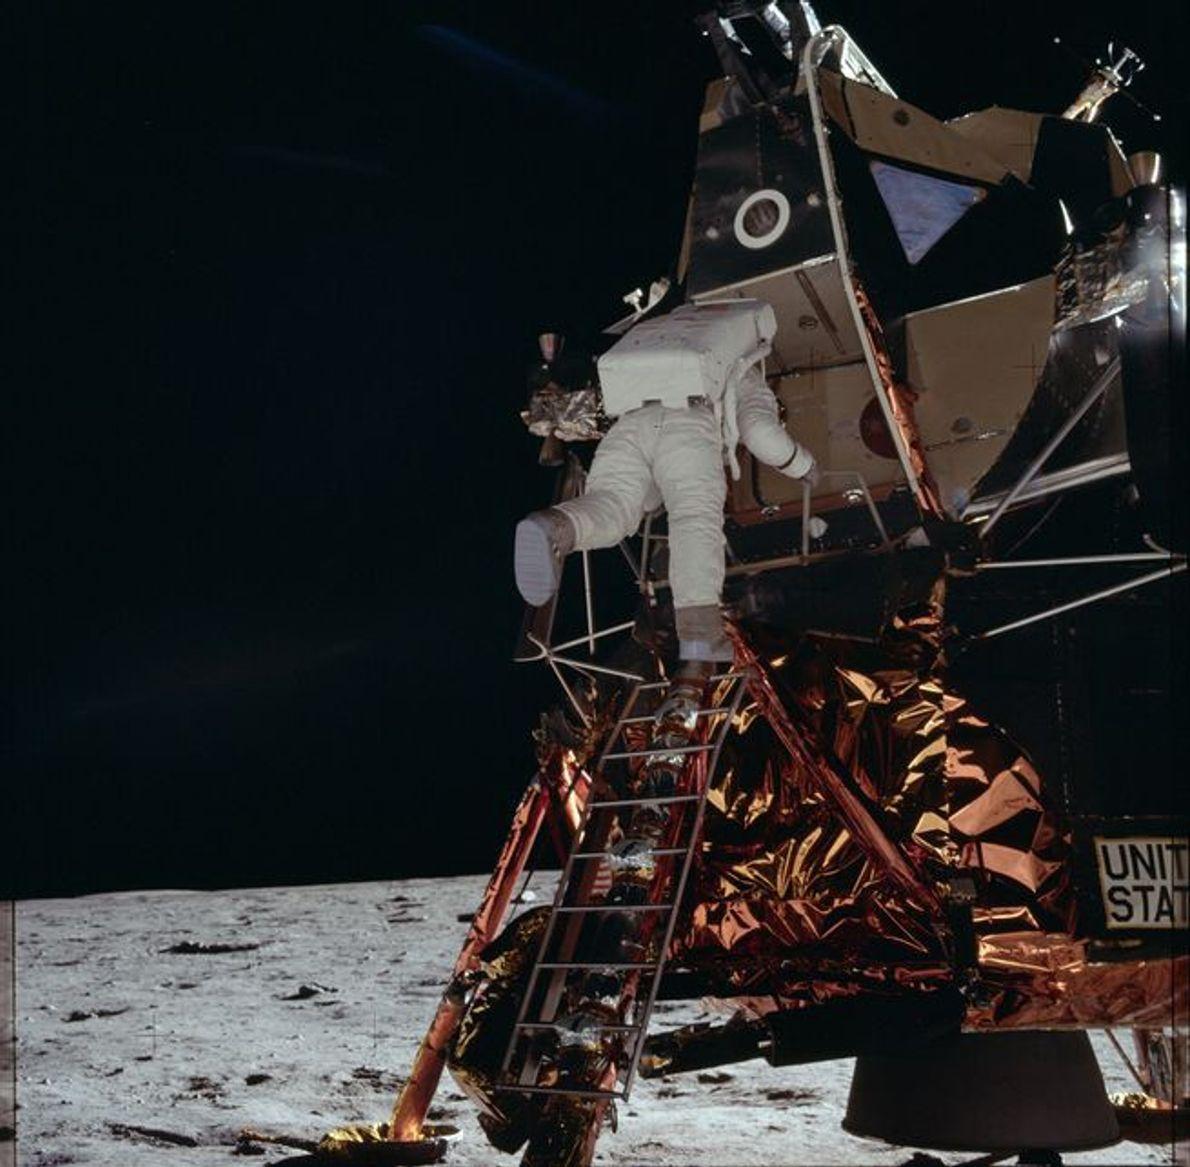 Astronaut Buzz Aldrin exits the Eagle lunar module as he prepares to take his historic walk ...